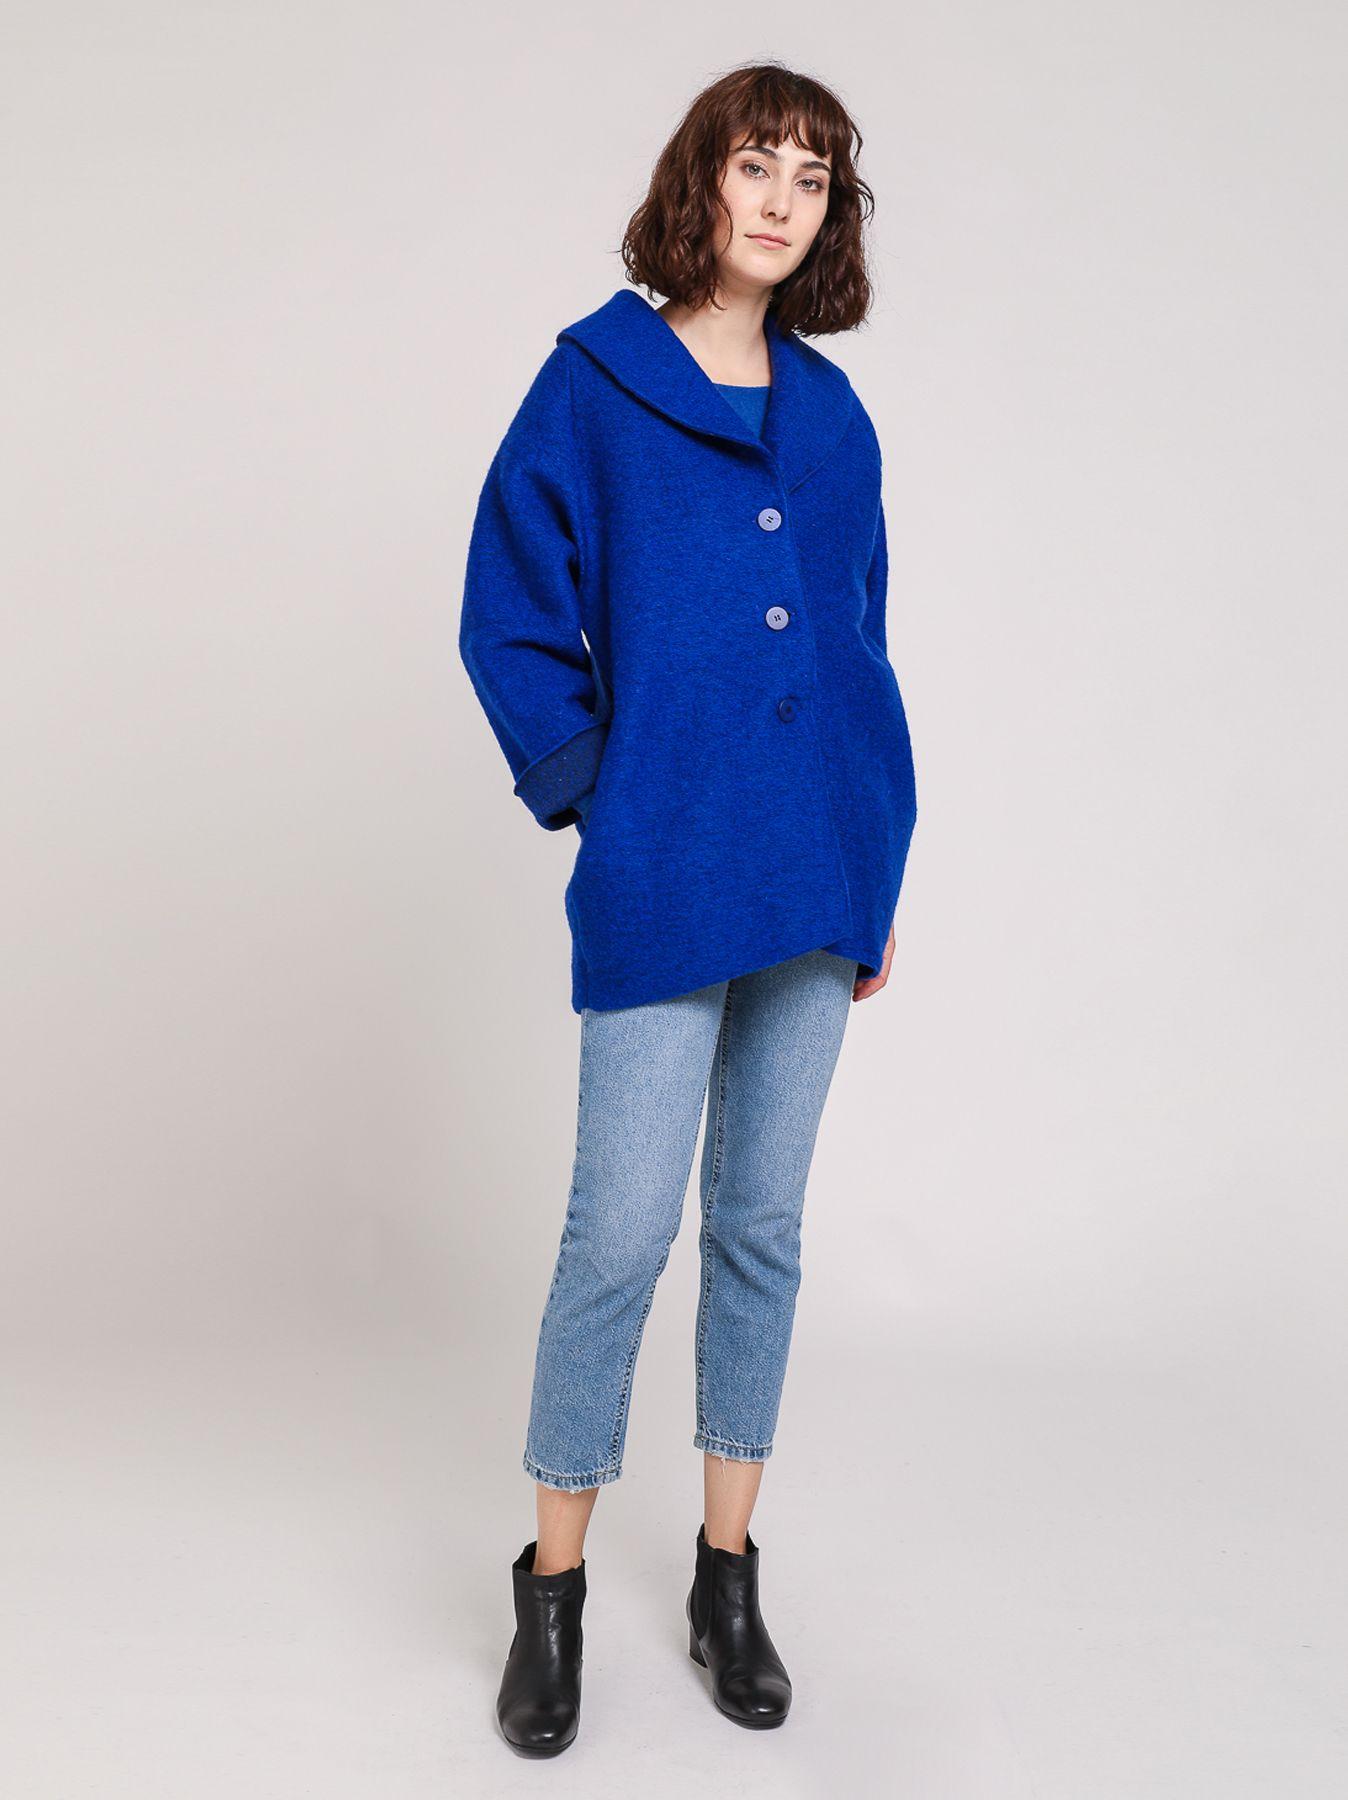 Giaccone in lana cotta